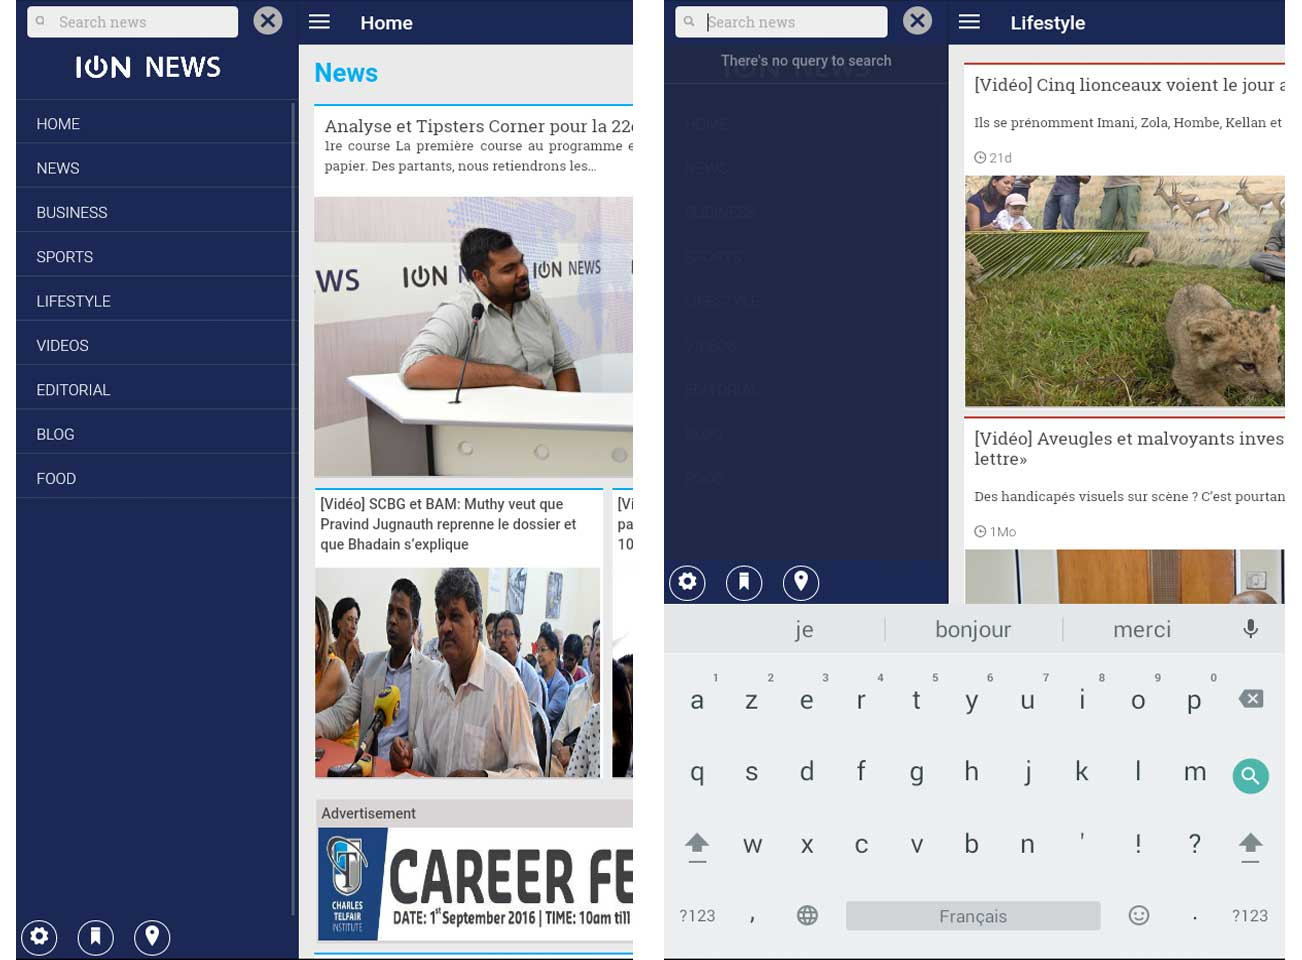 ION News app